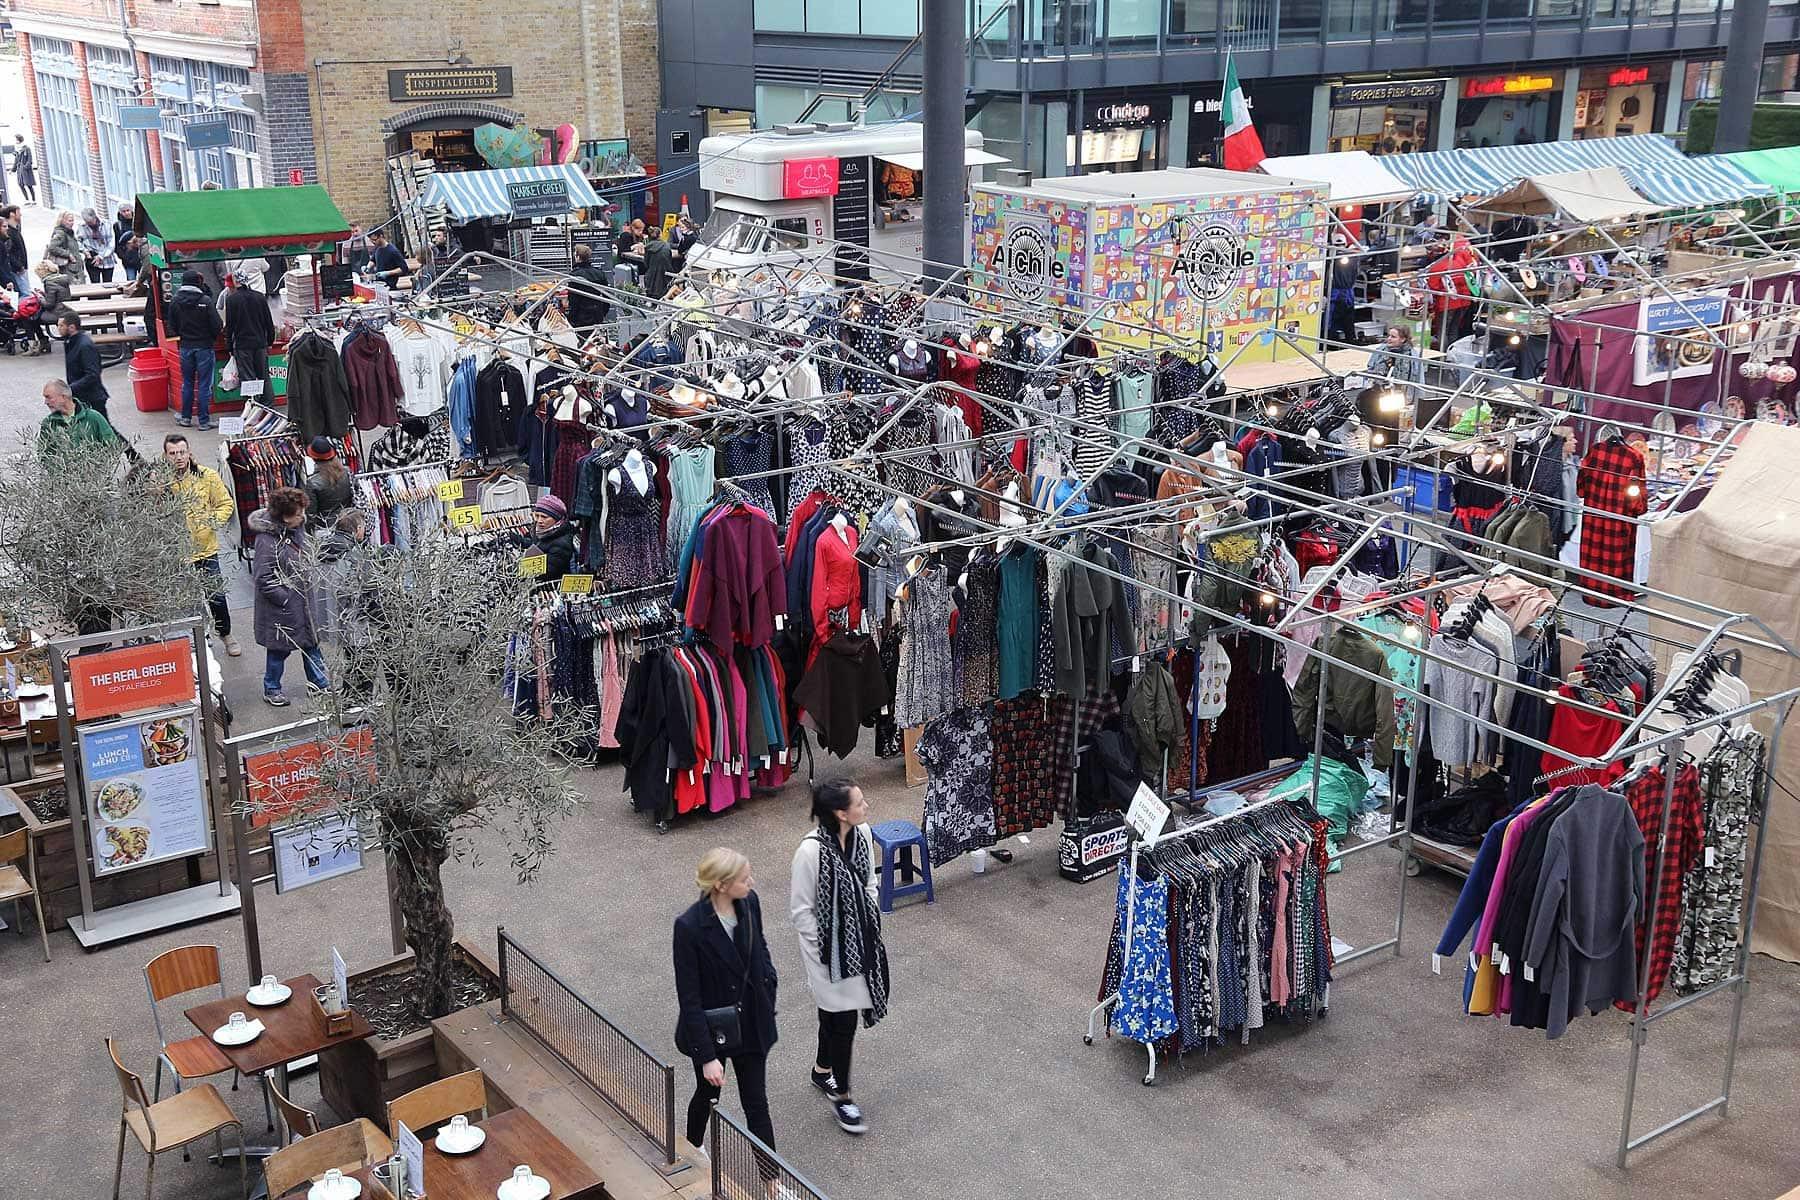 Old Spitalfields Market in London. Photo by Tupungato / Shutterstock.com